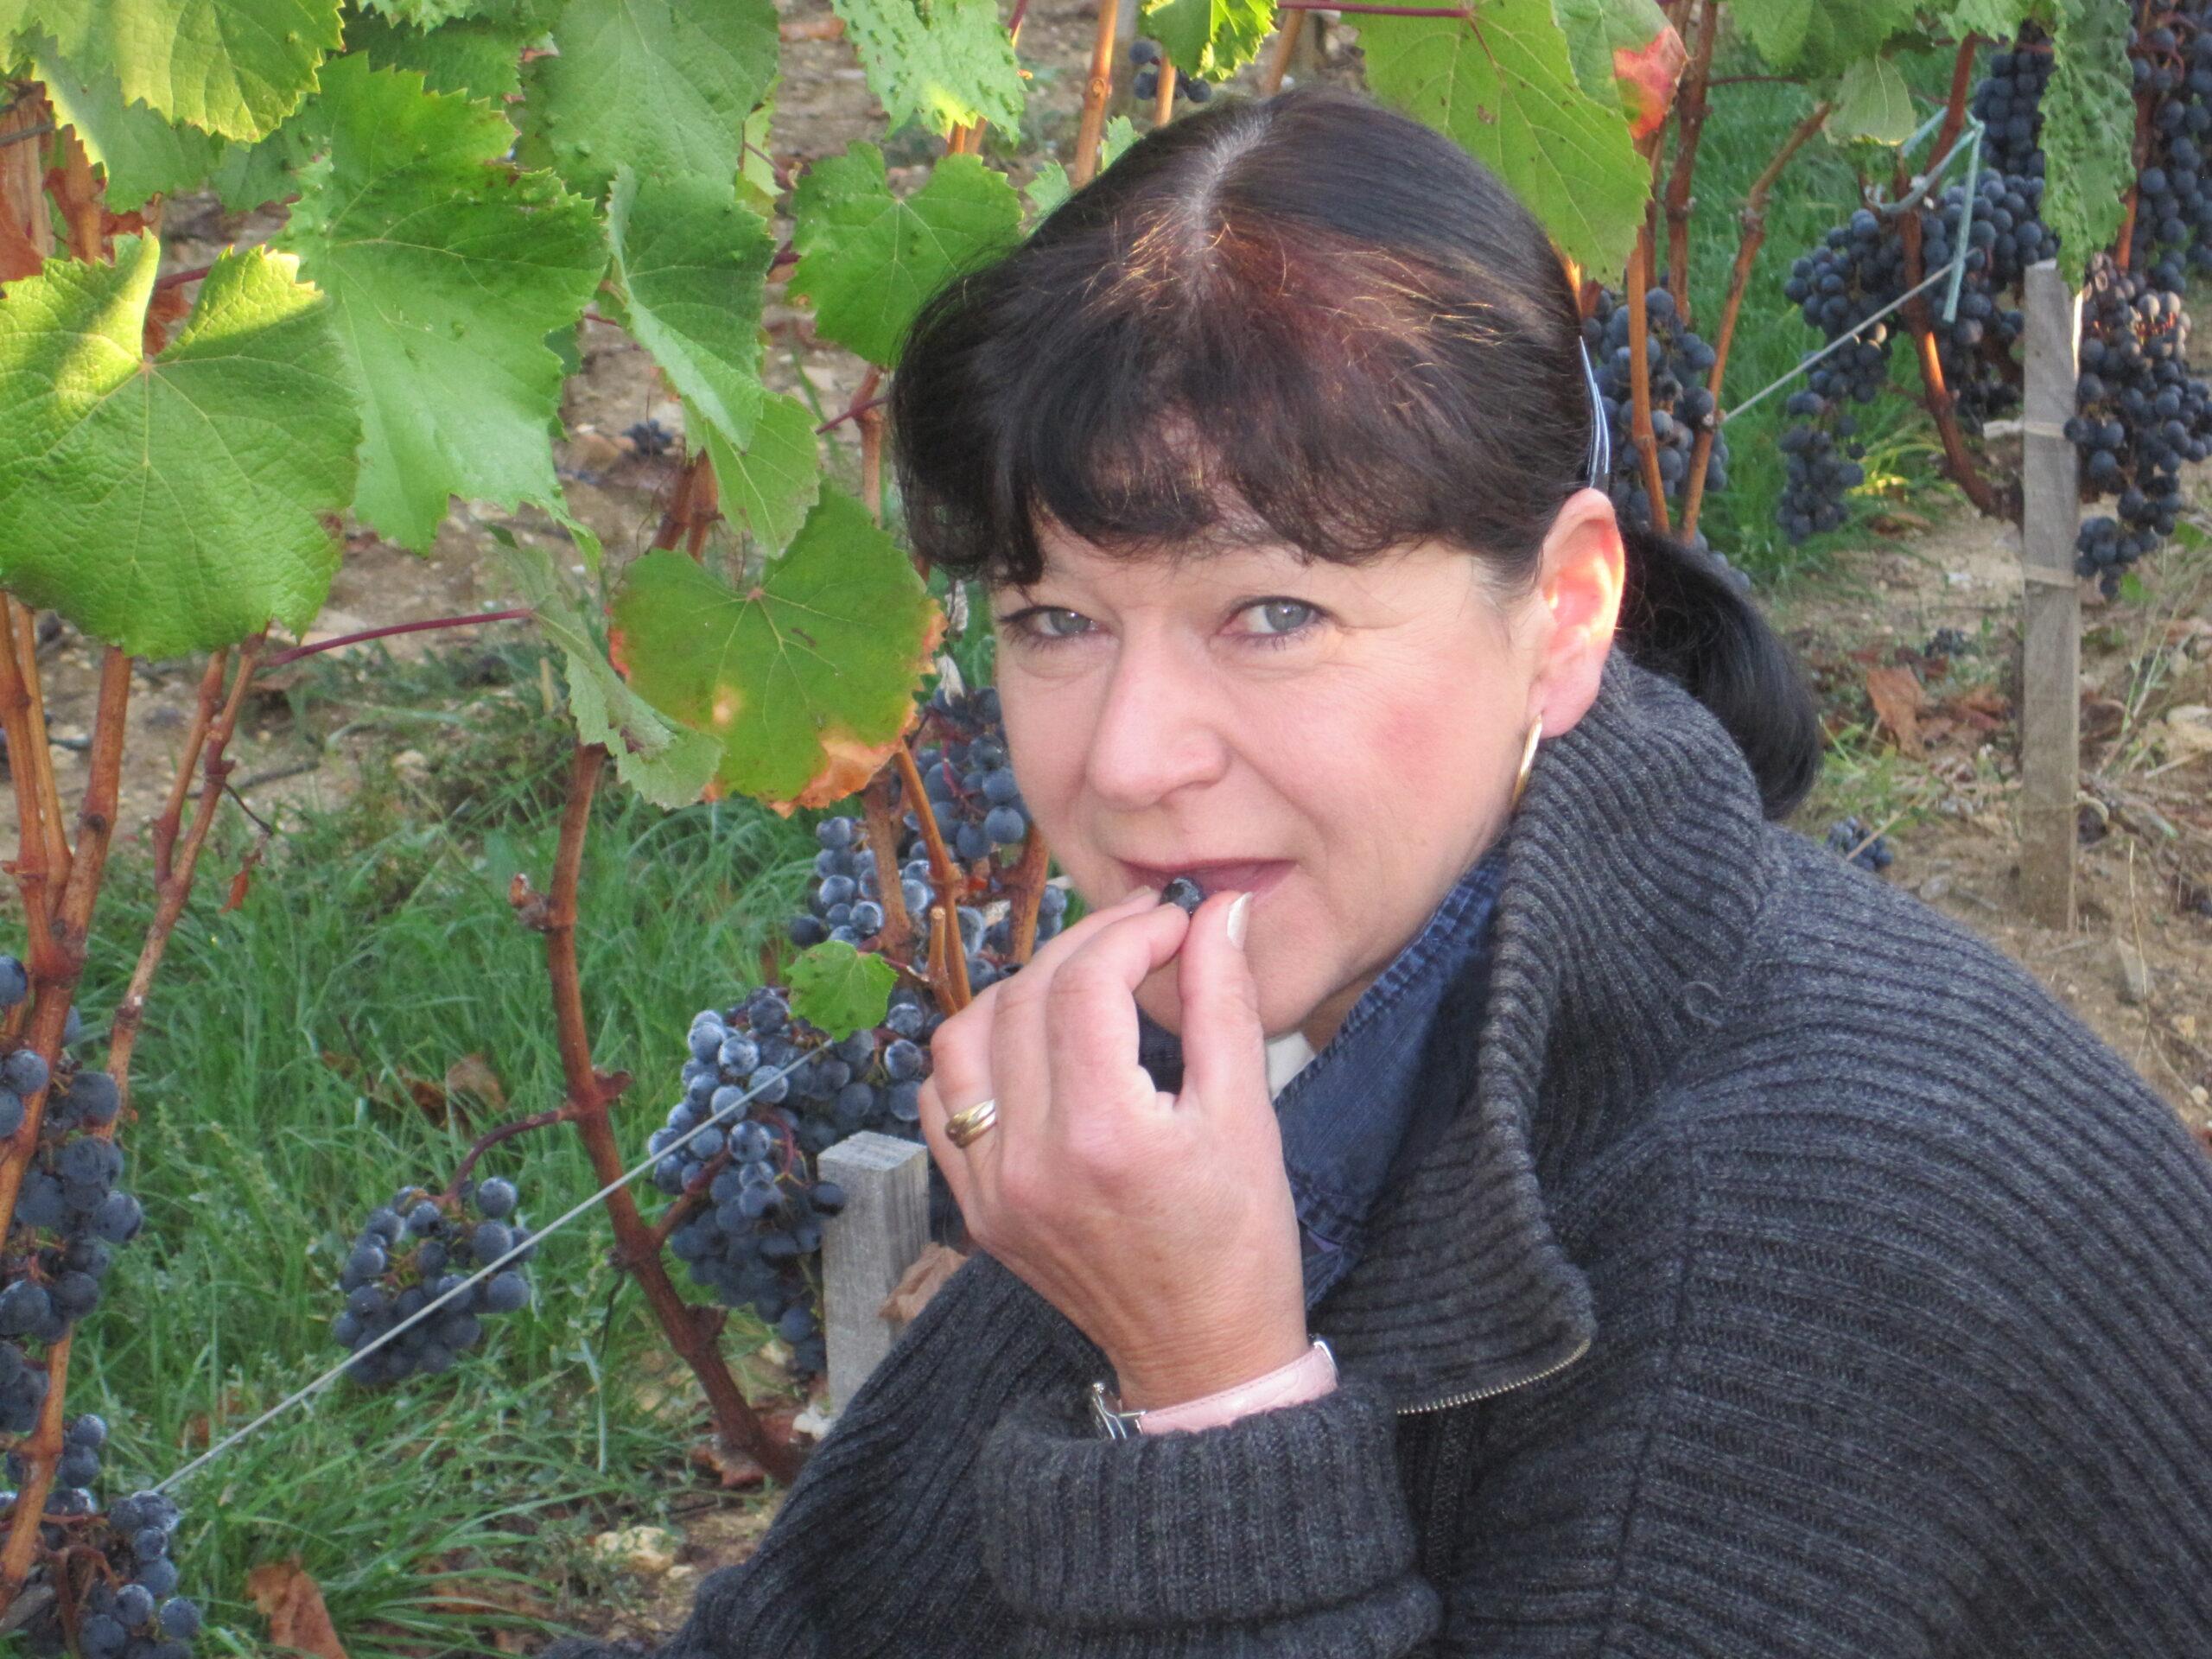 Wine Tasting at Chateau Latour, Chateau Mouton and Valandraud